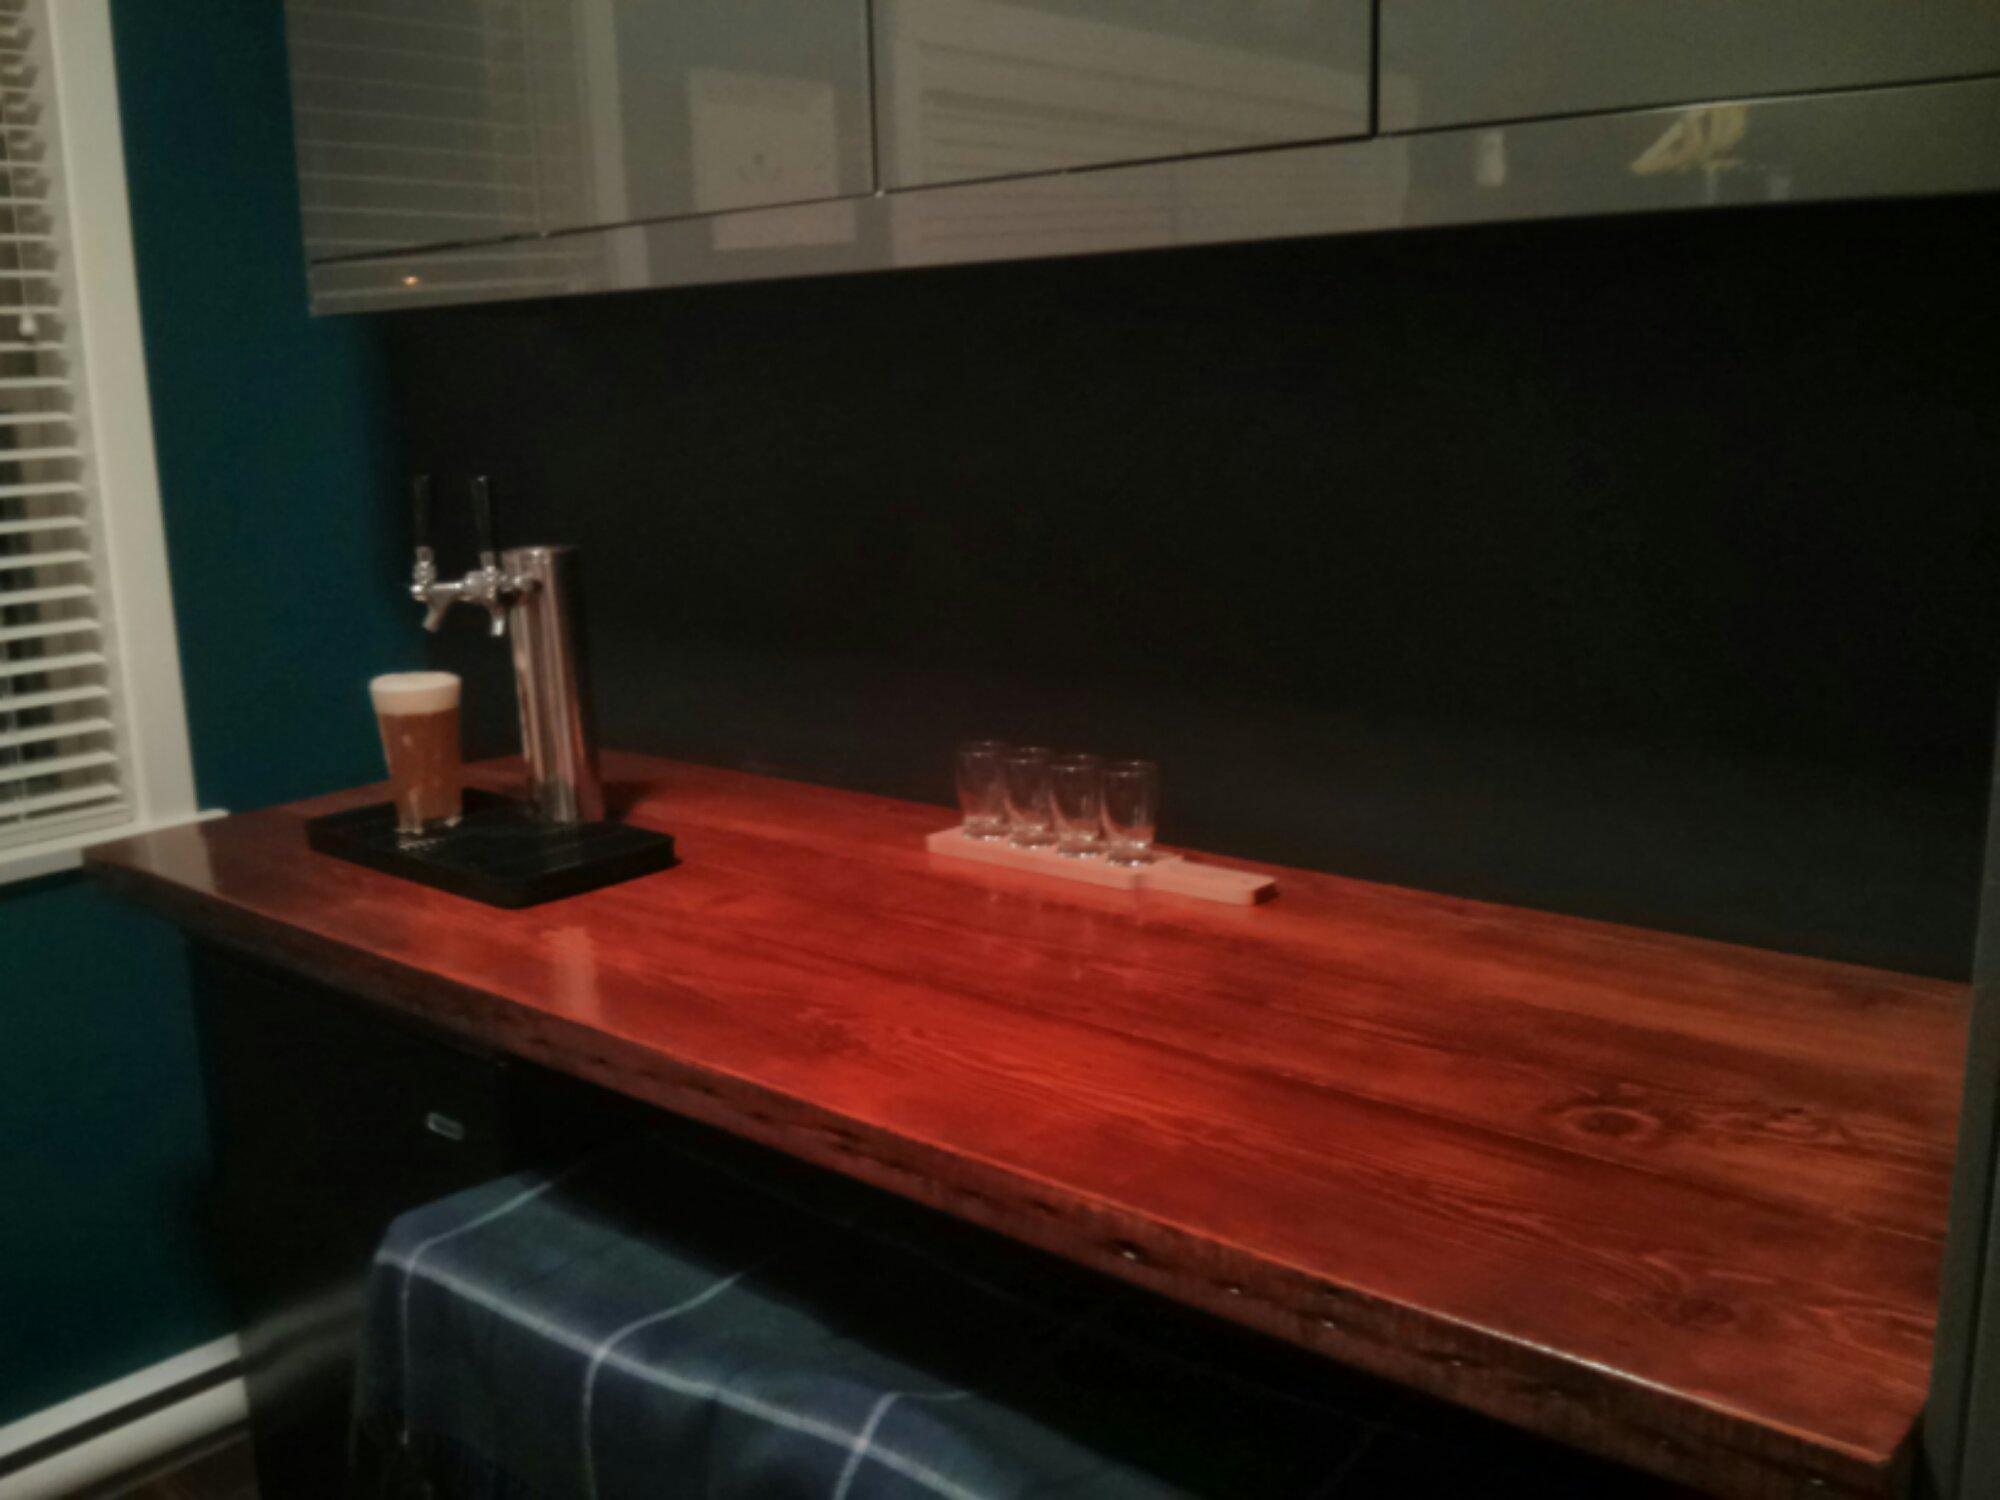 Bar counter built from reclaimed materials haggis bigos for Built in bar counter